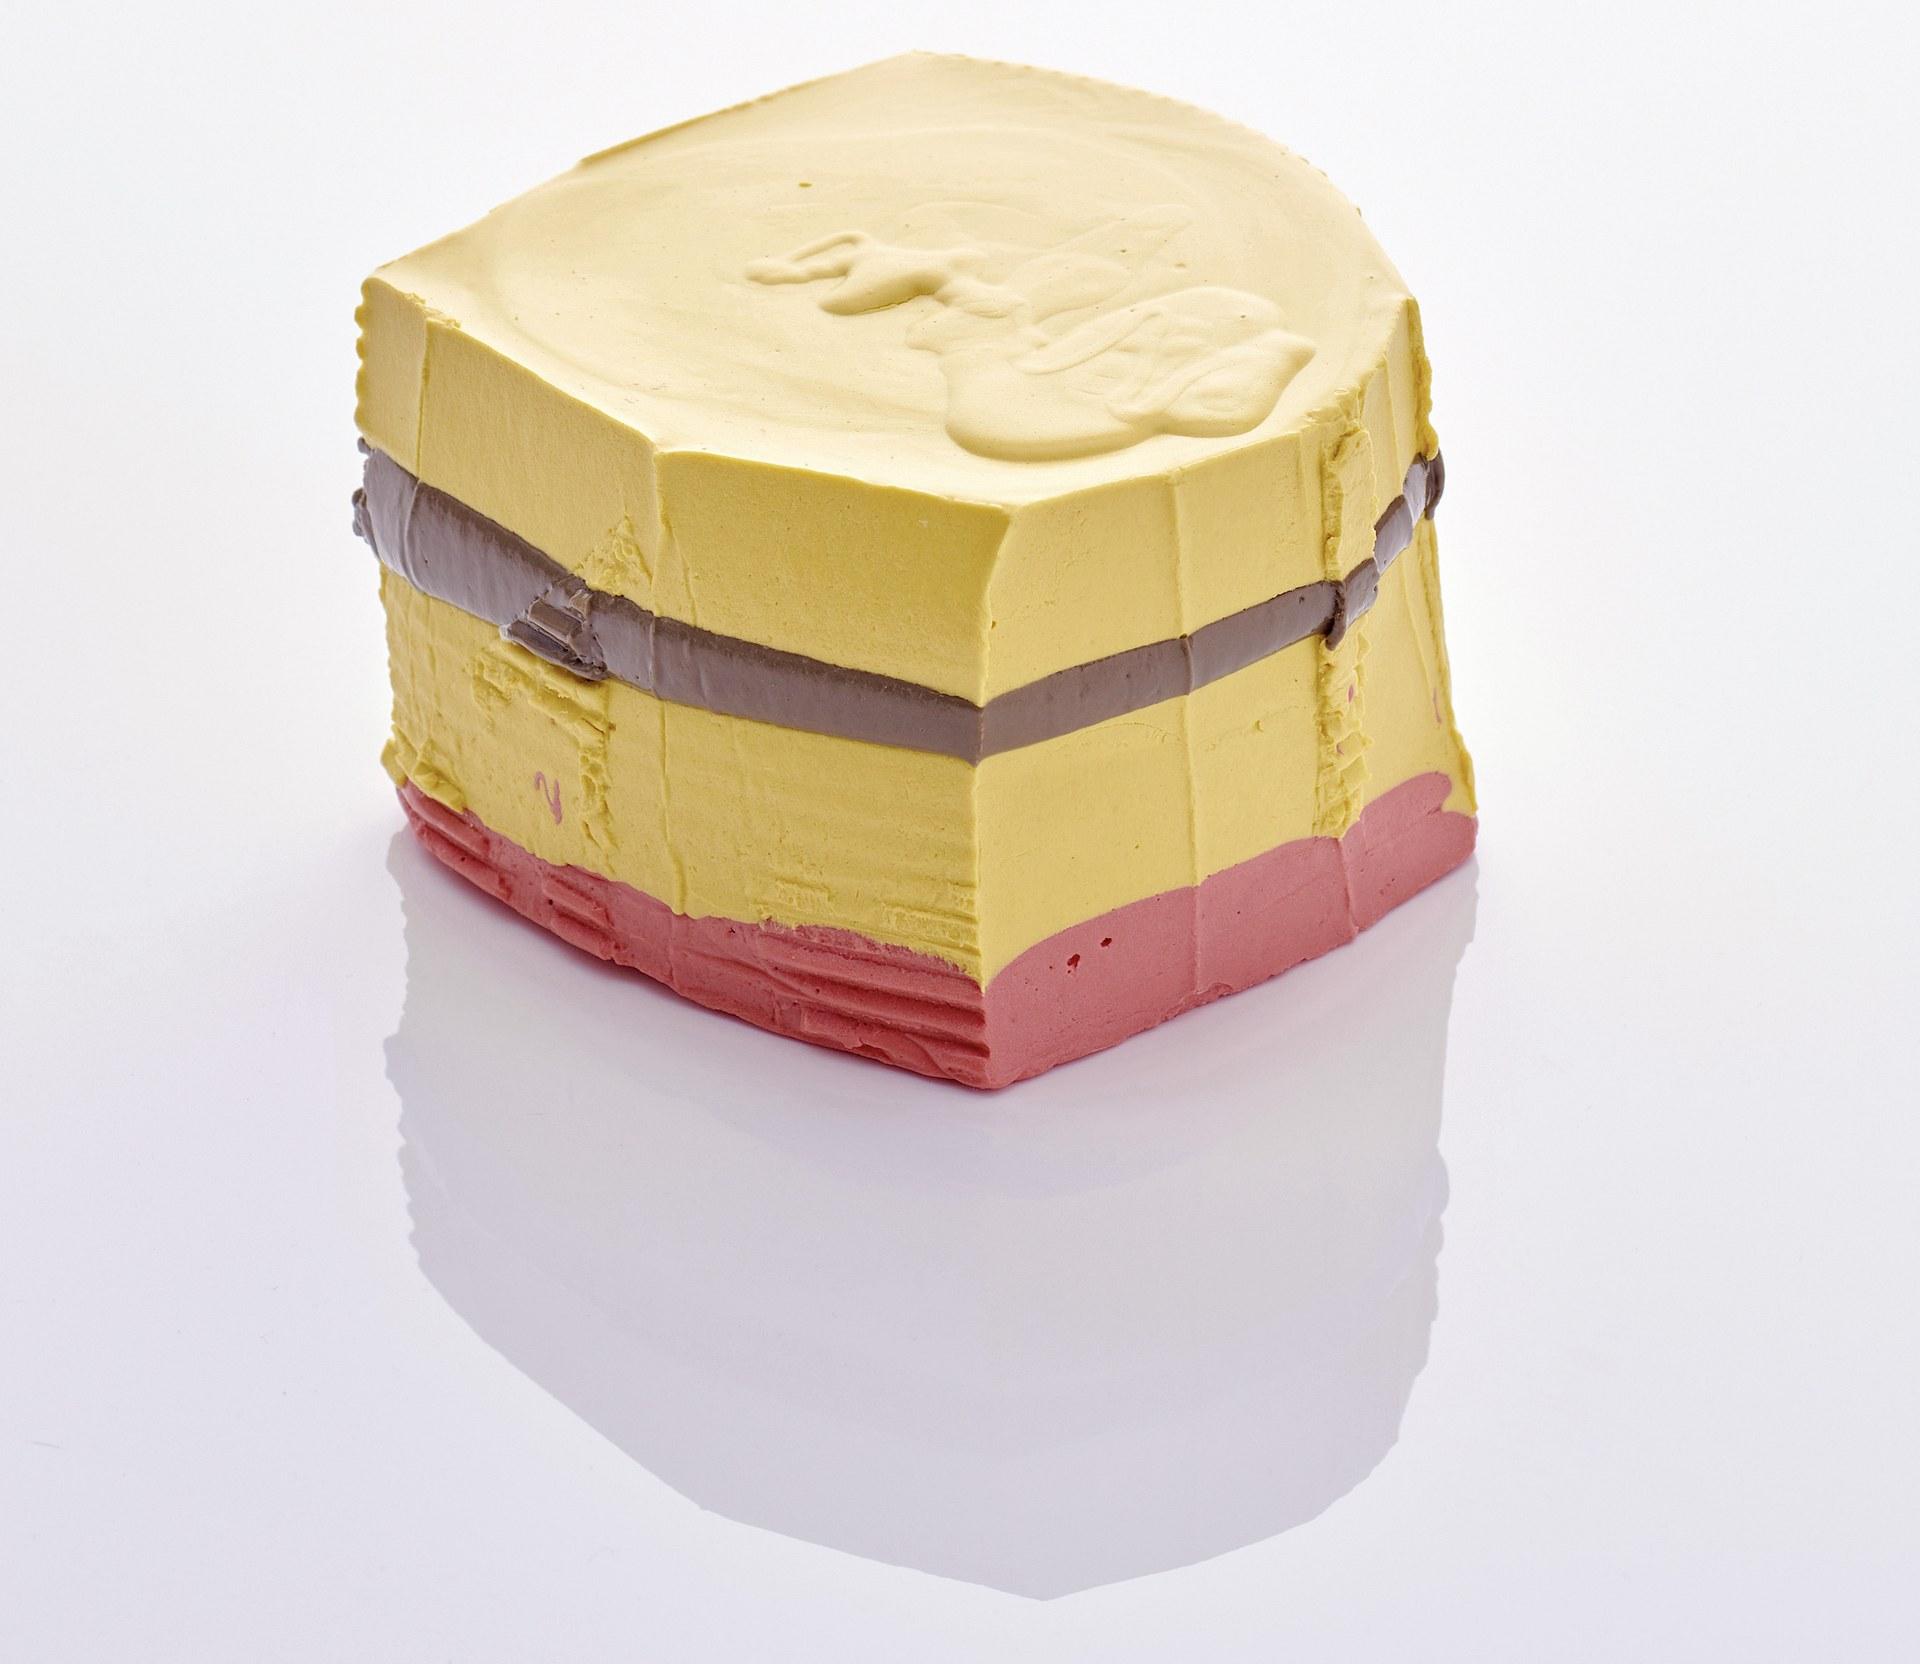 I Am Not A Sponge Cake II, 2020